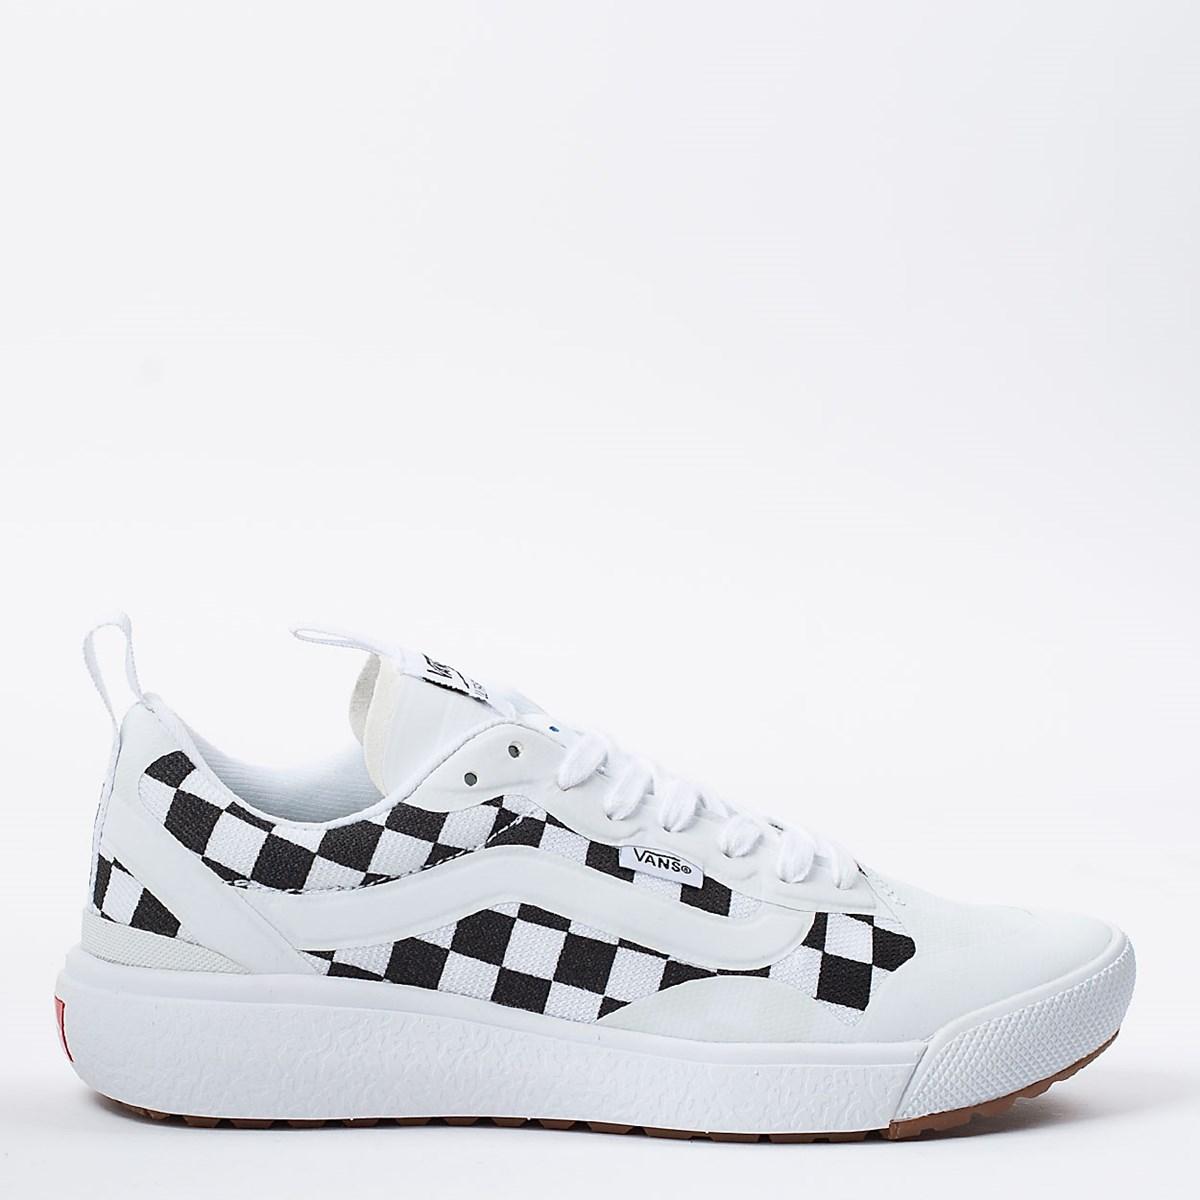 Tênis Vans Ultrarange Exo Checkerboard True White Black VN0A4U1K27I